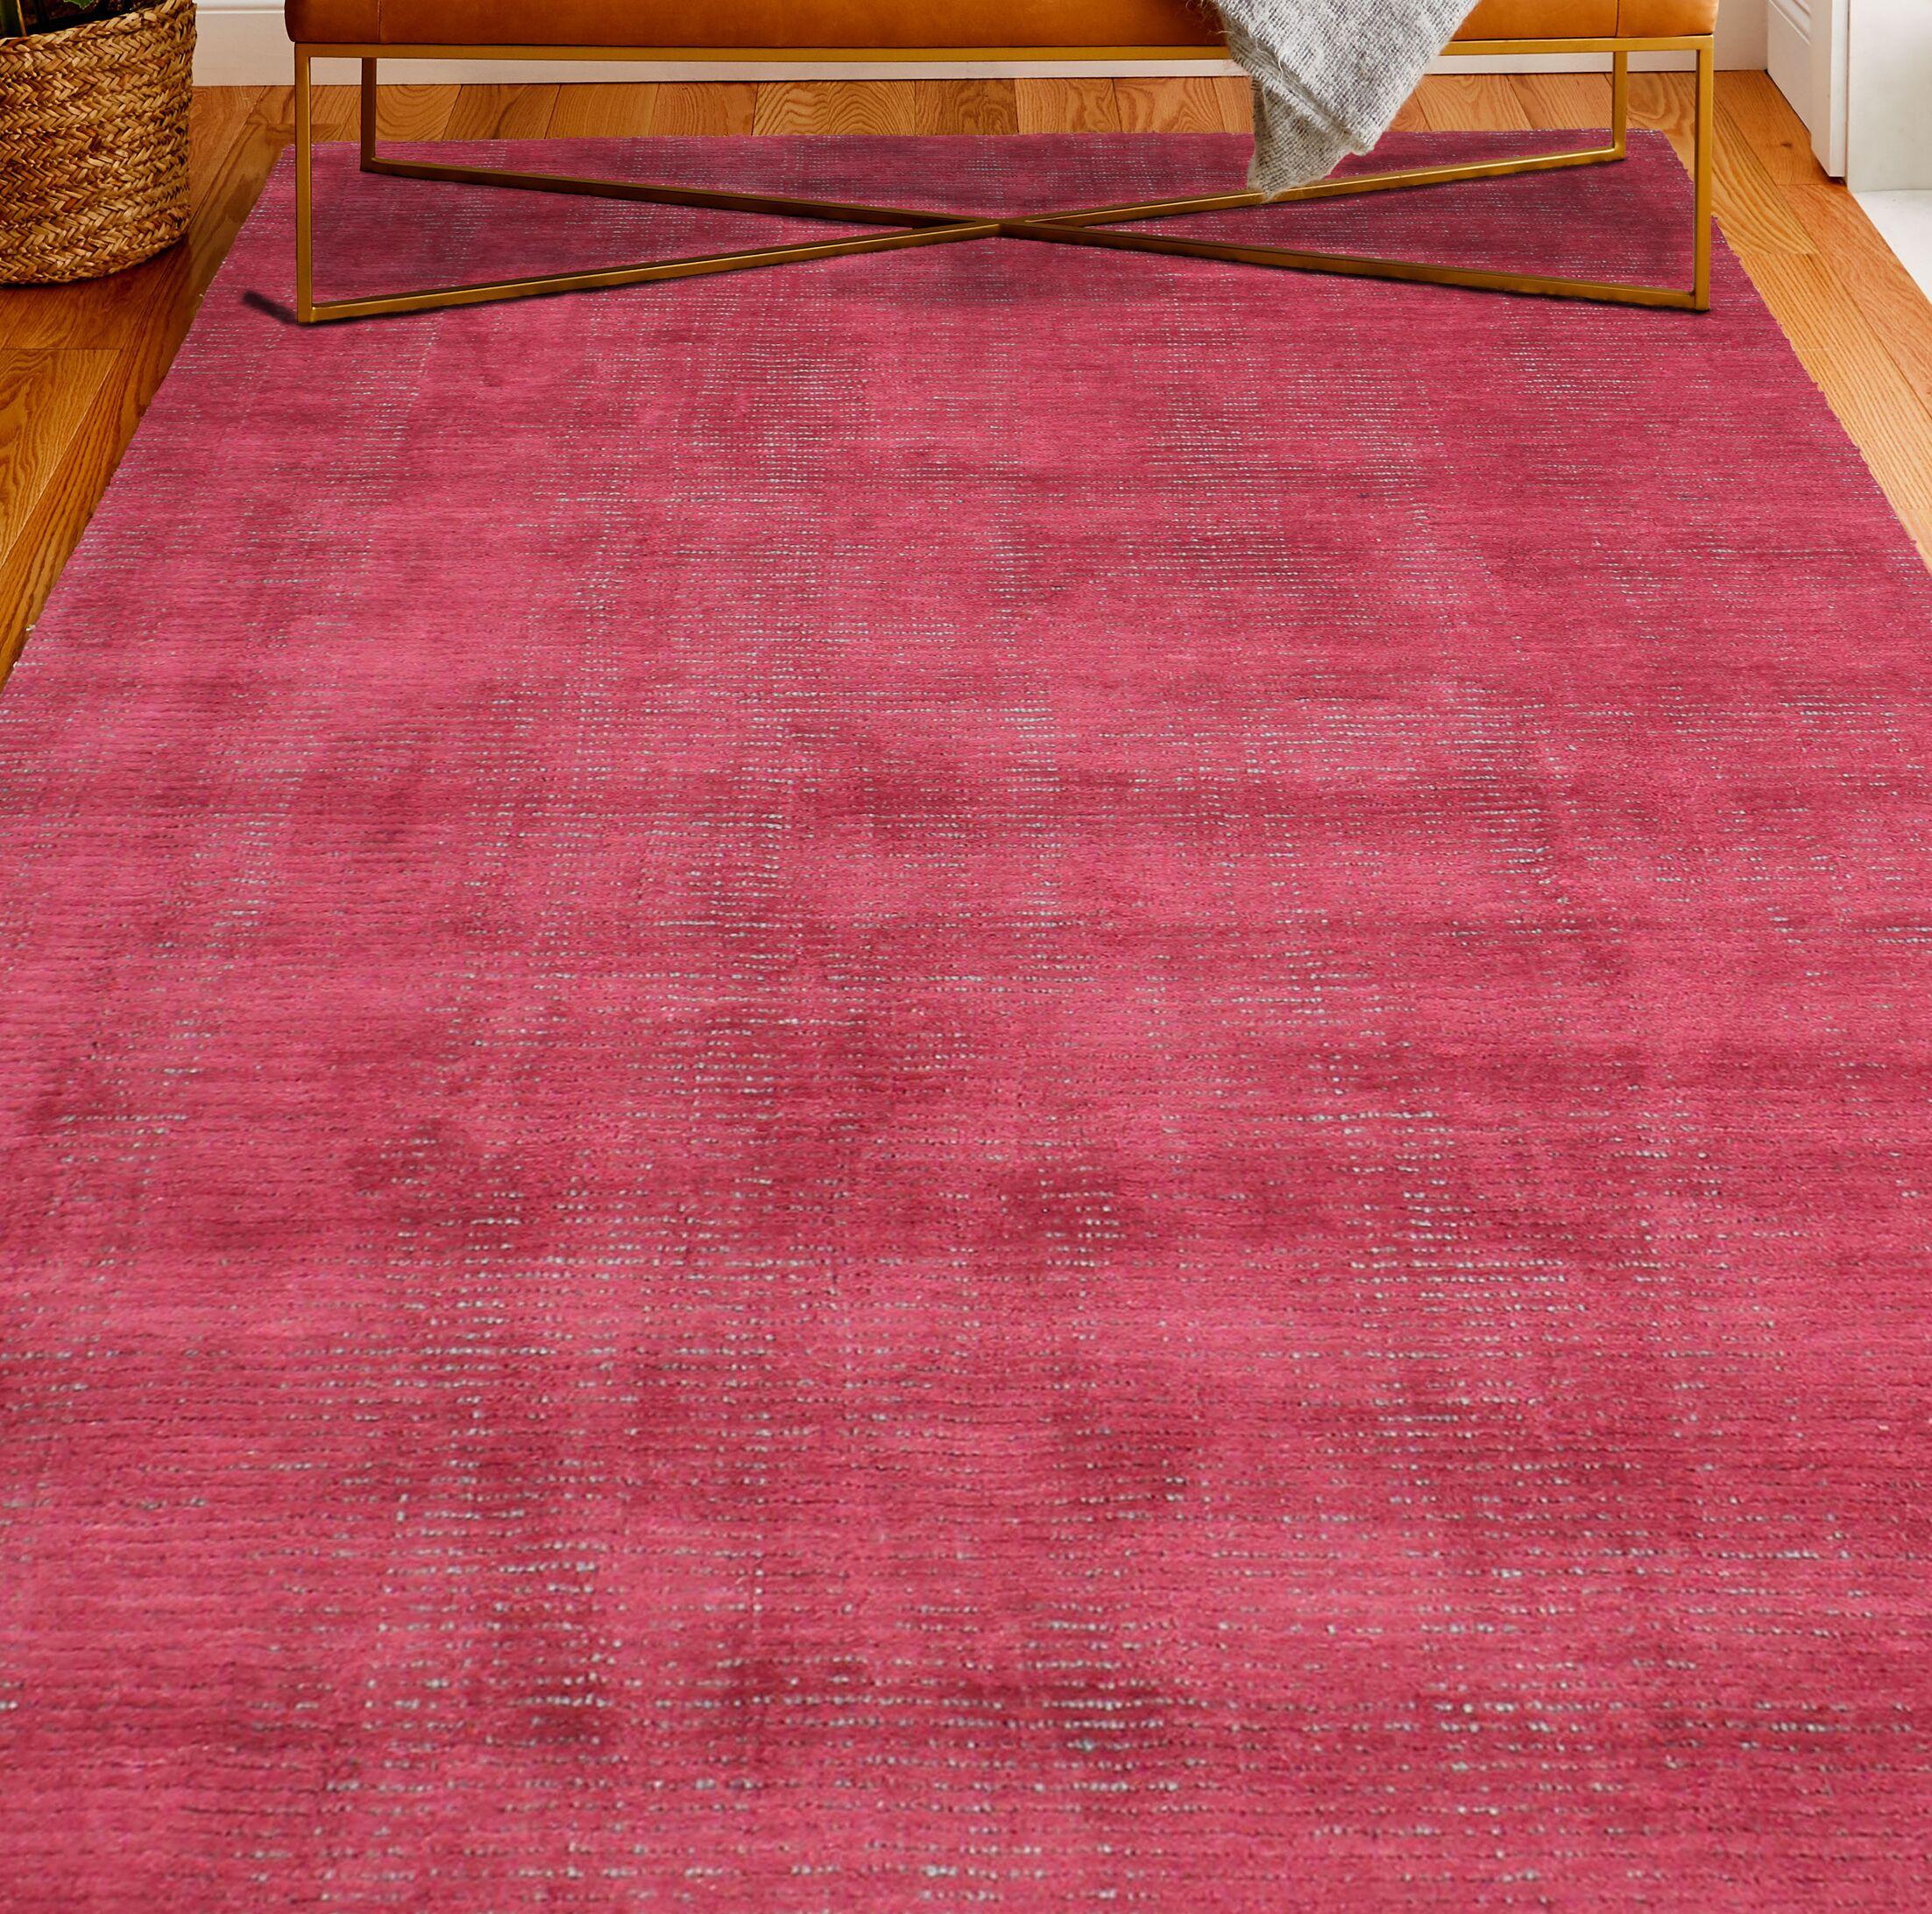 Hawkinson Wool Red Area Rug Rug Size: Rectangle 5' x 7'6